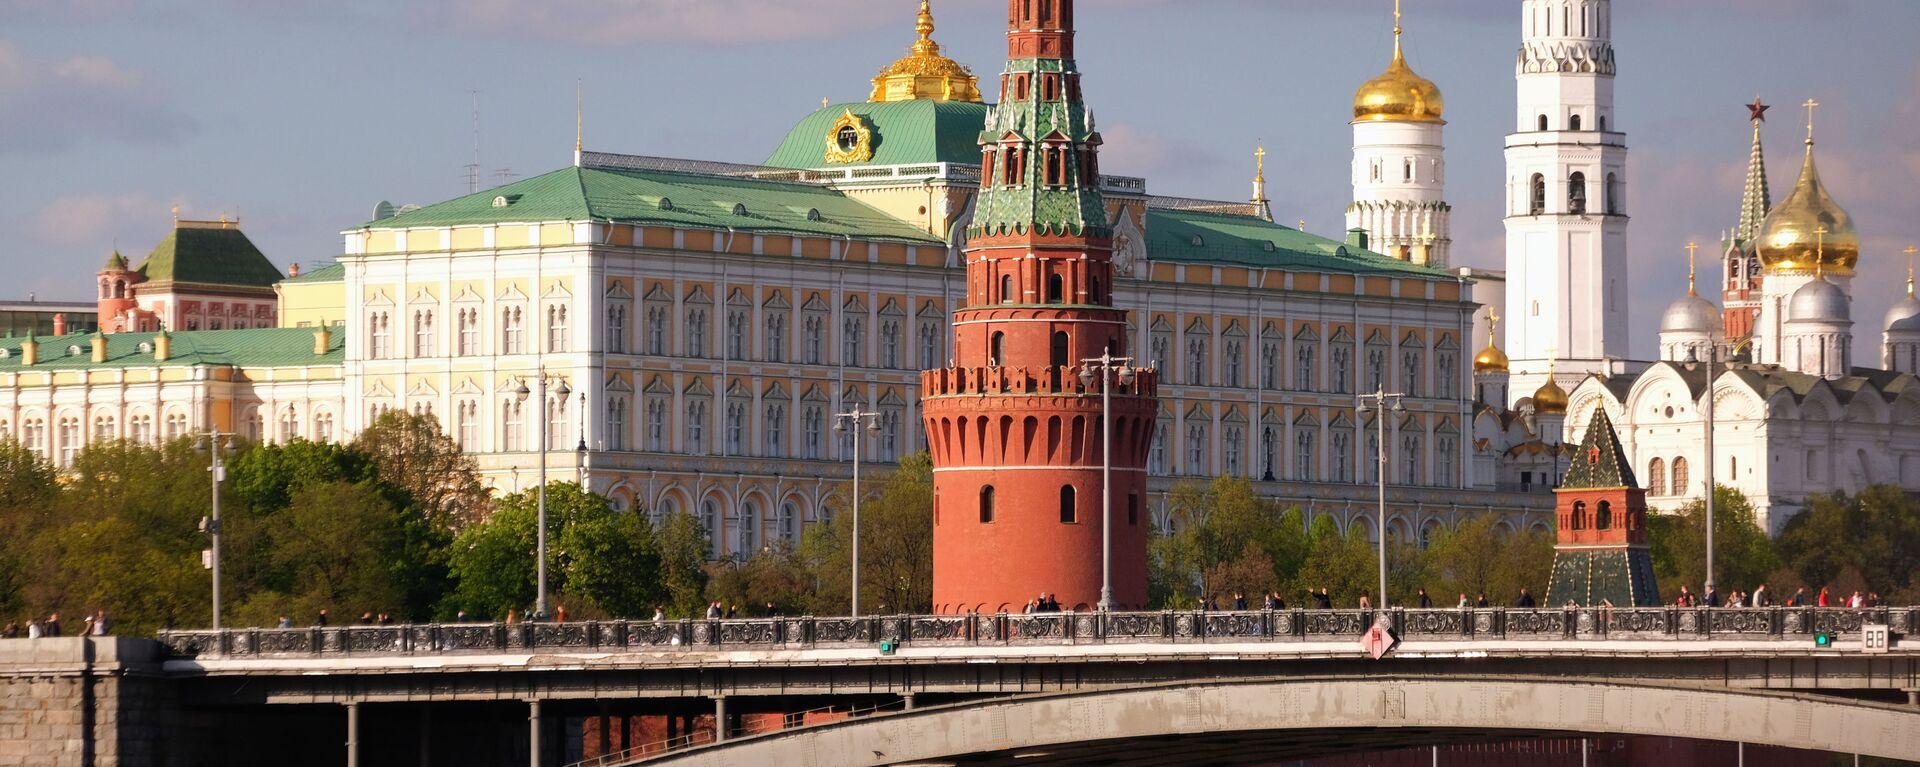 Moskiewski Kreml - Sputnik Polska, 1920, 07.09.2021